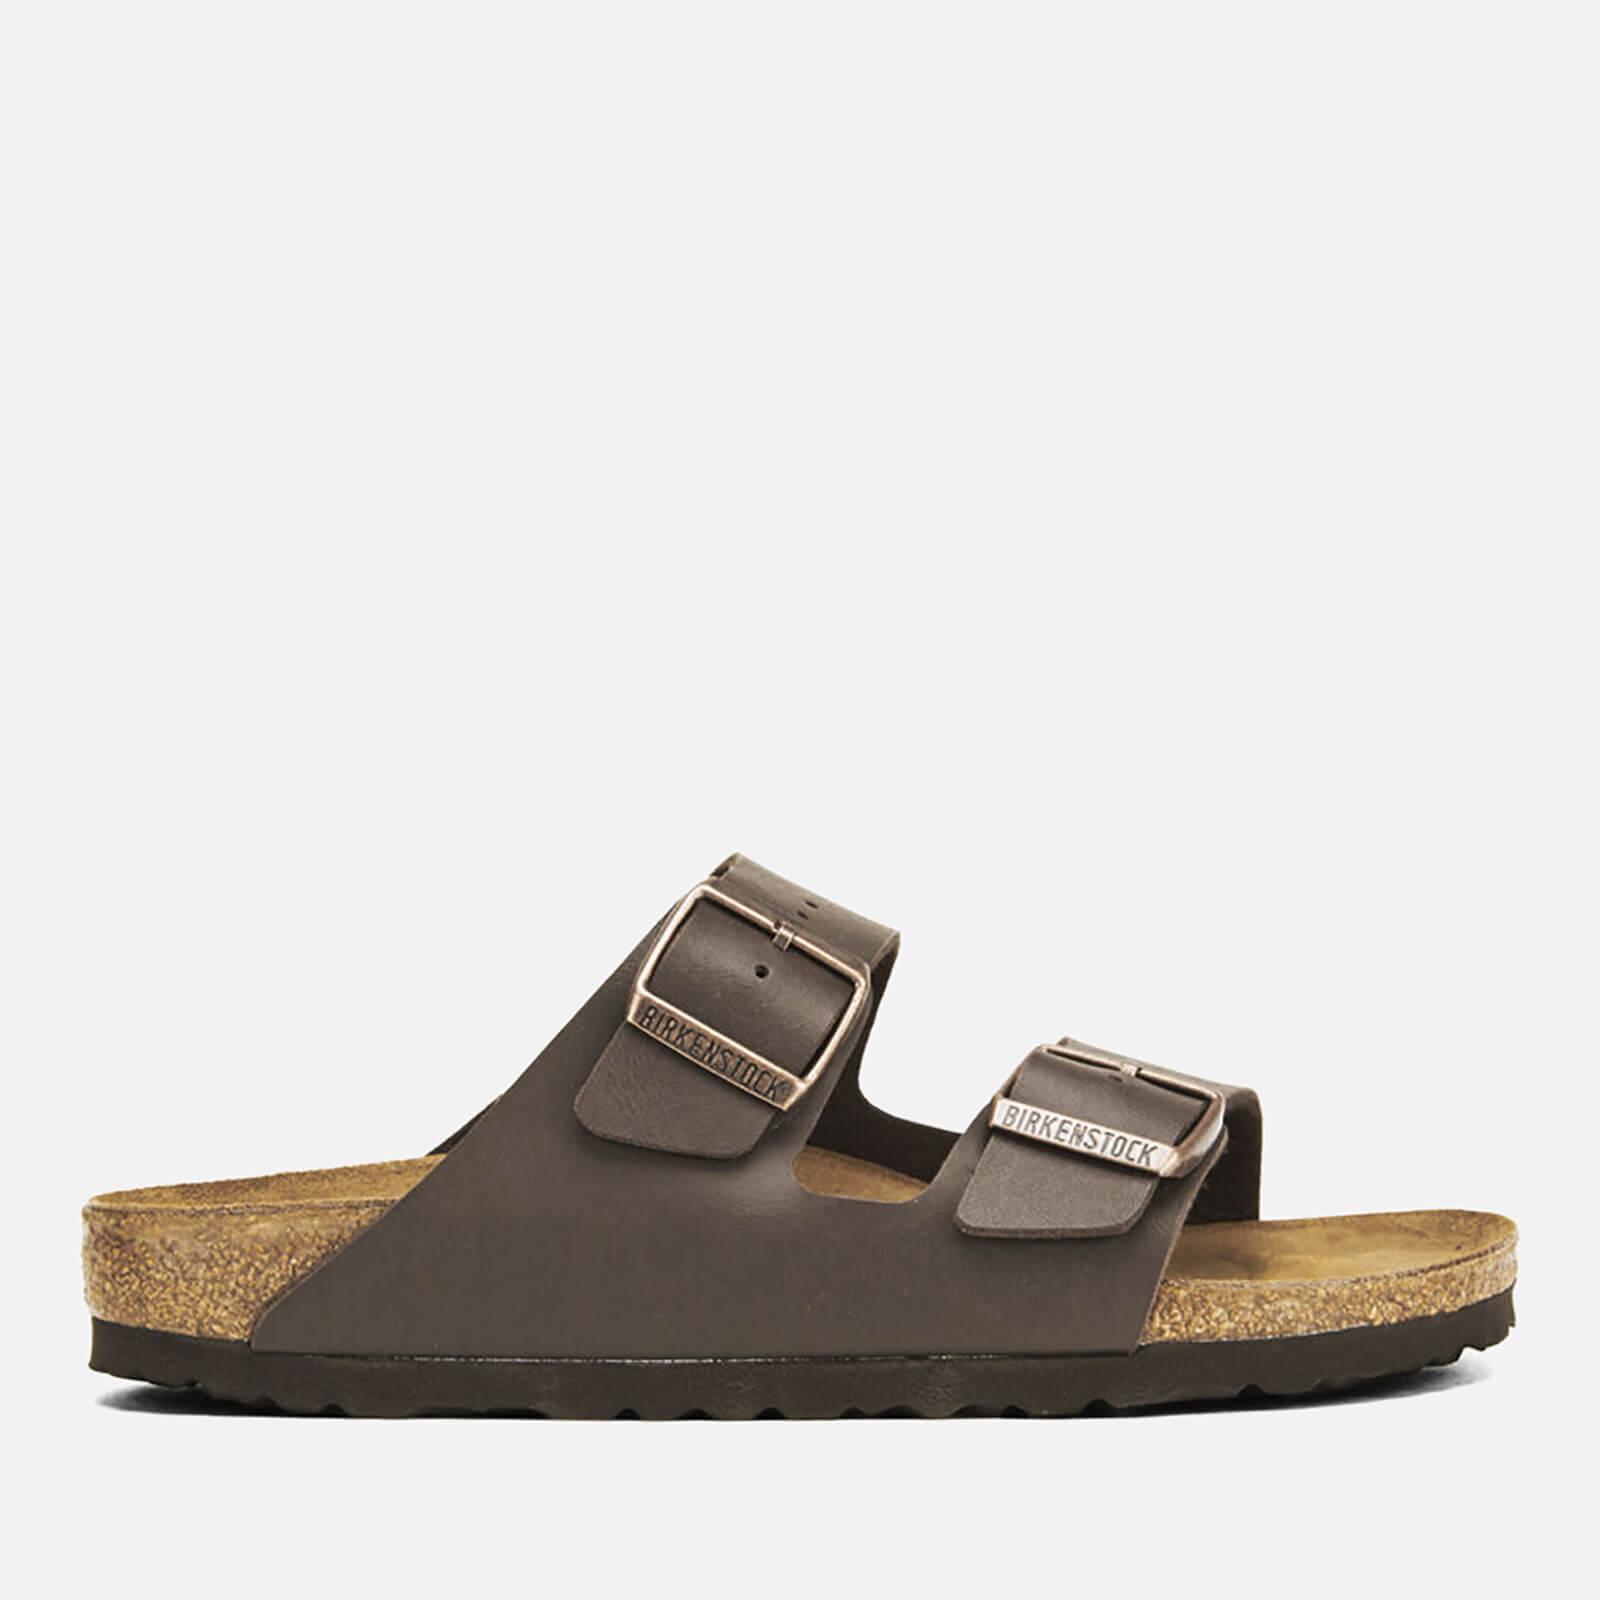 Birkenstock Women's Arizona Double Strap Sandals - Dark Brown - EU 38/UK 5